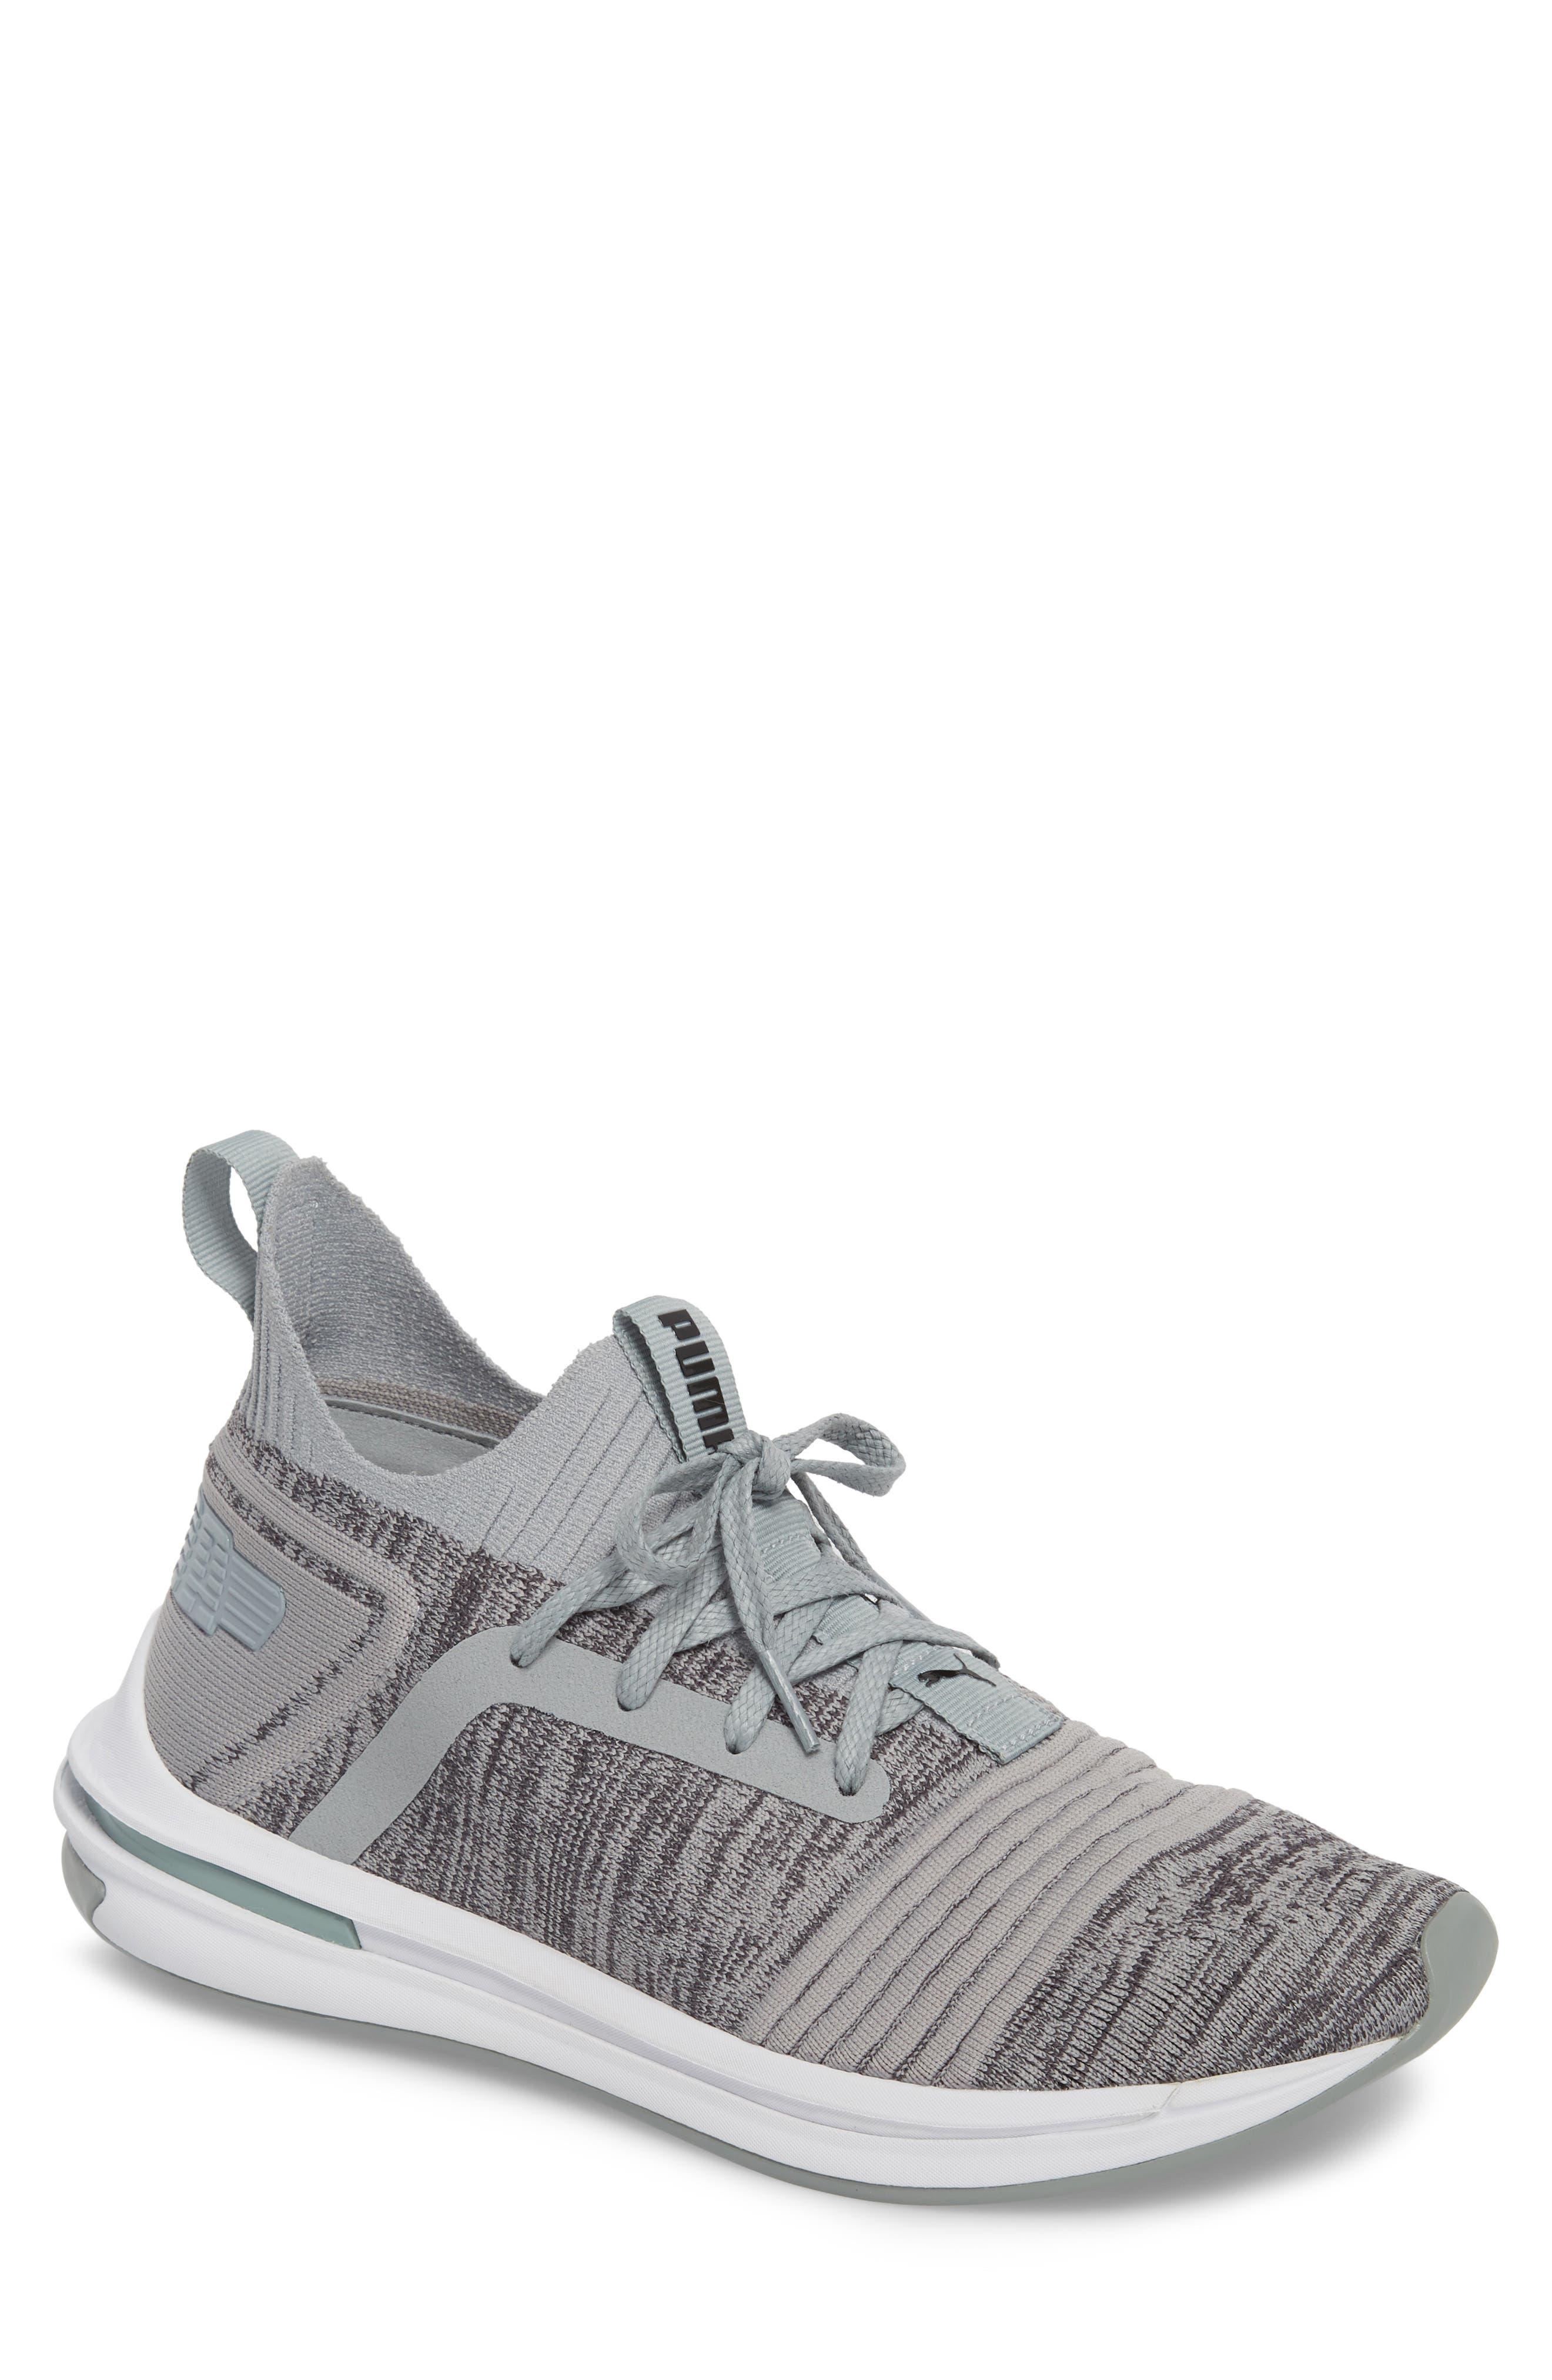 IGNITE Limitless SR evoKNIT Sneaker,                             Main thumbnail 2, color,